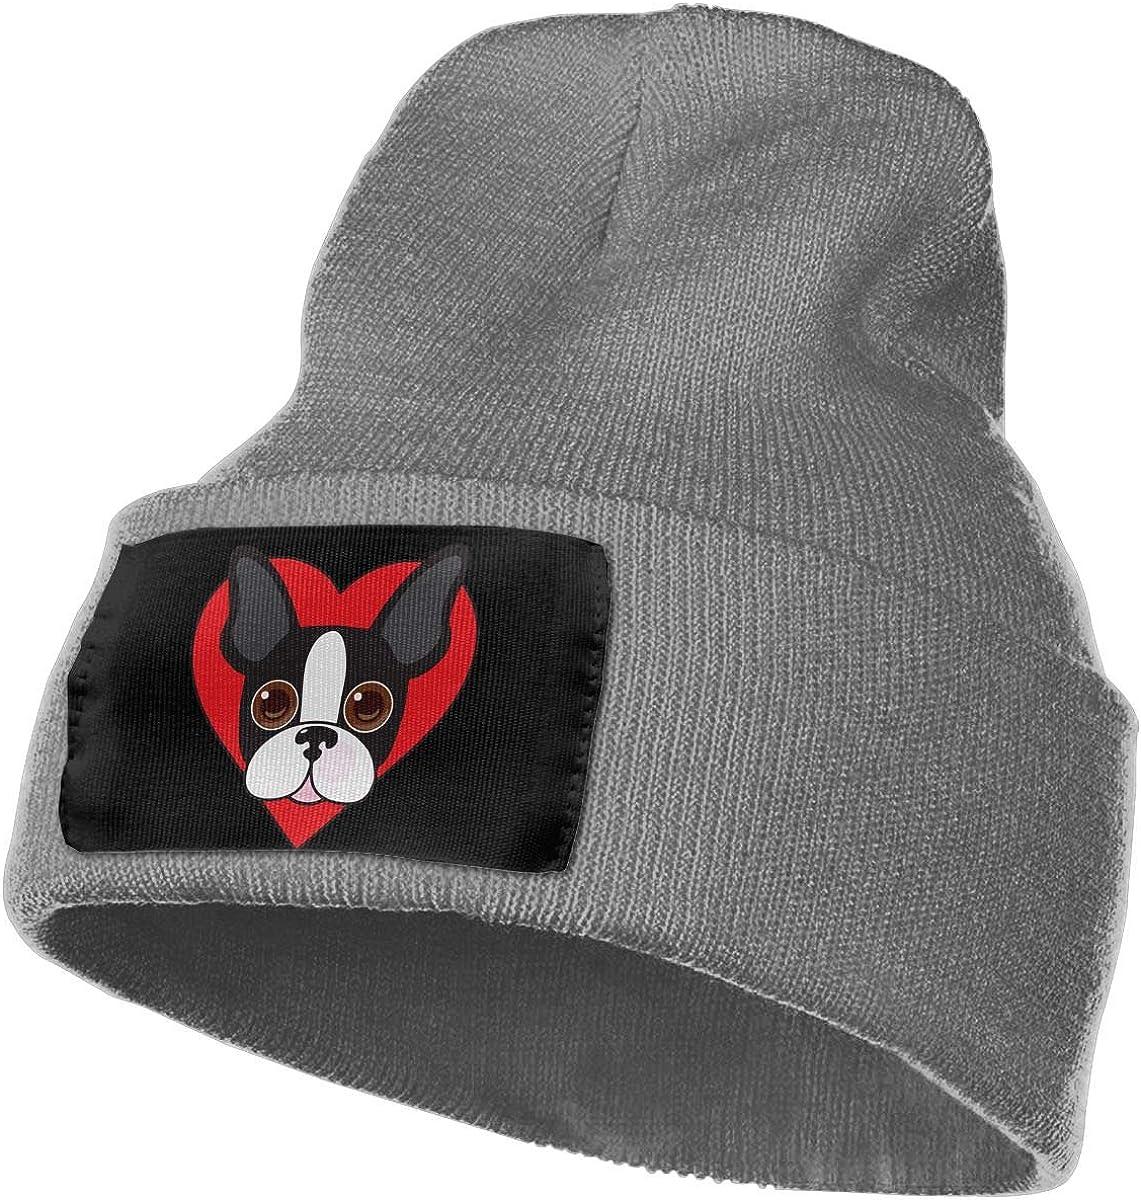 WHOO93@Y Mens Womens 100/% Acrylic Knitting Hat Cap Boston Terrier Face Soft Skull Cap